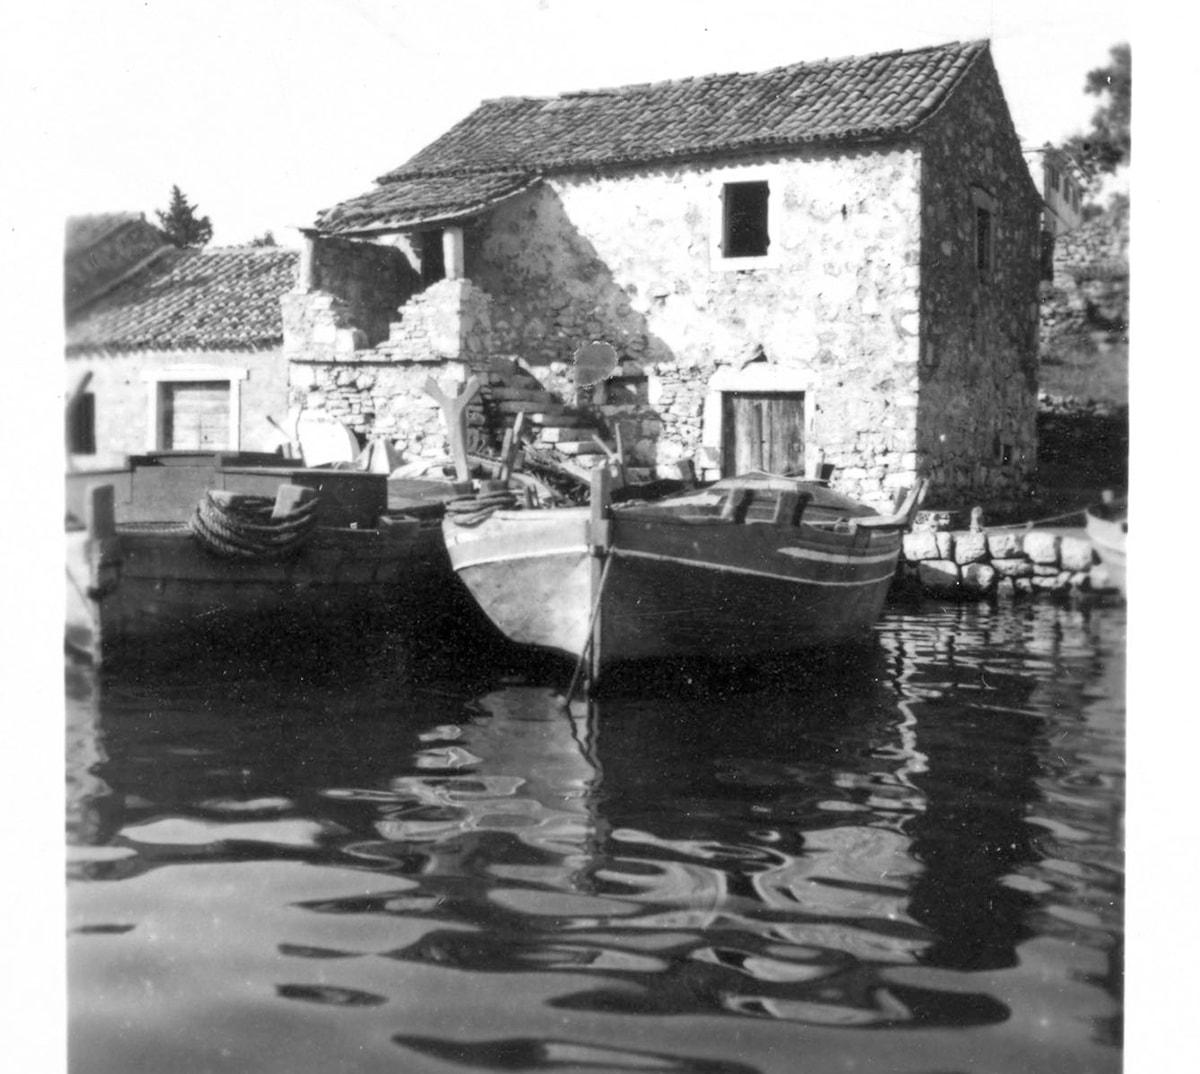 14.Luka, stara seoska arhitektura, Petricioli 8.7.1951.